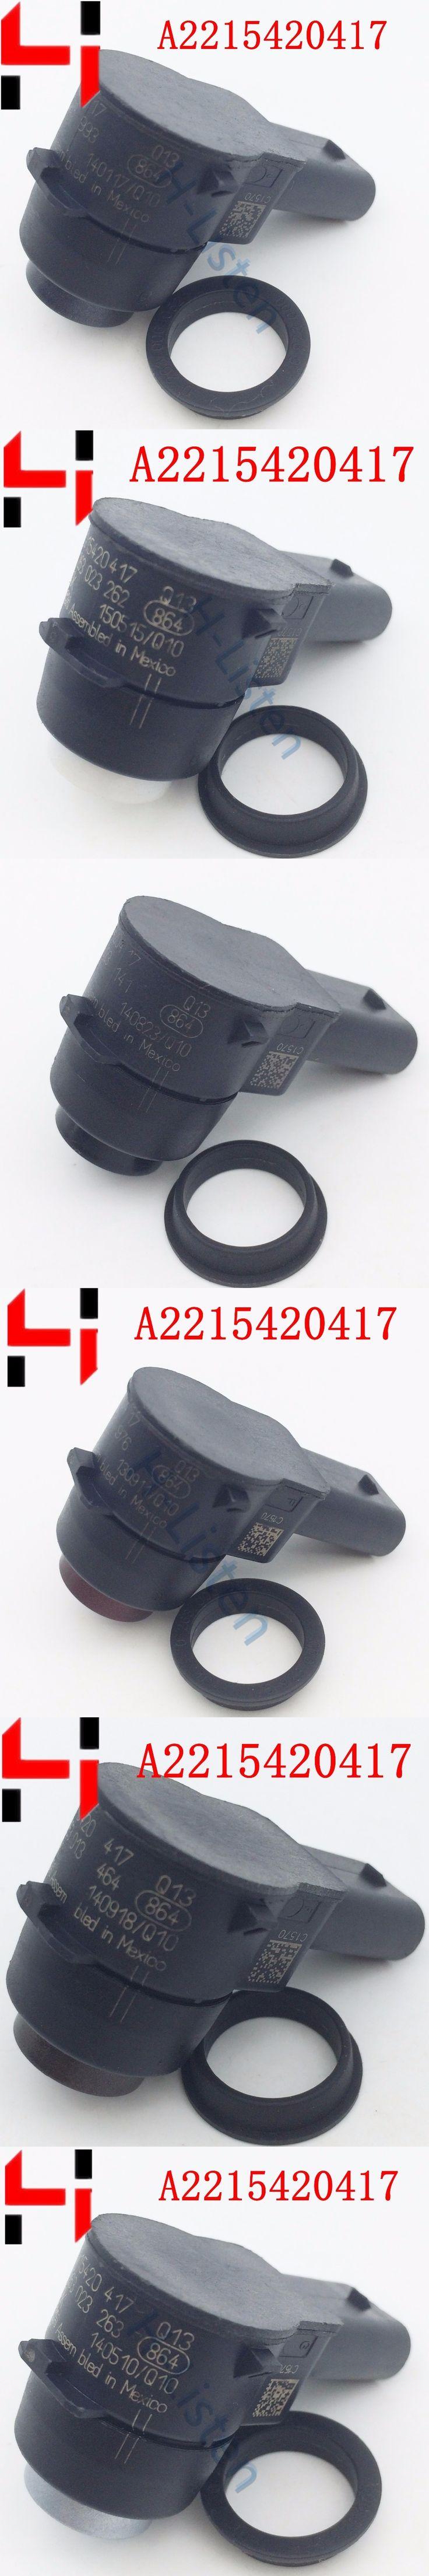 PDC Parking Distance Control Aid Sensors For Mercedes GL320 GL350 ML320 ML350 C320 SL500 E R S Class A2215420417 2215420417